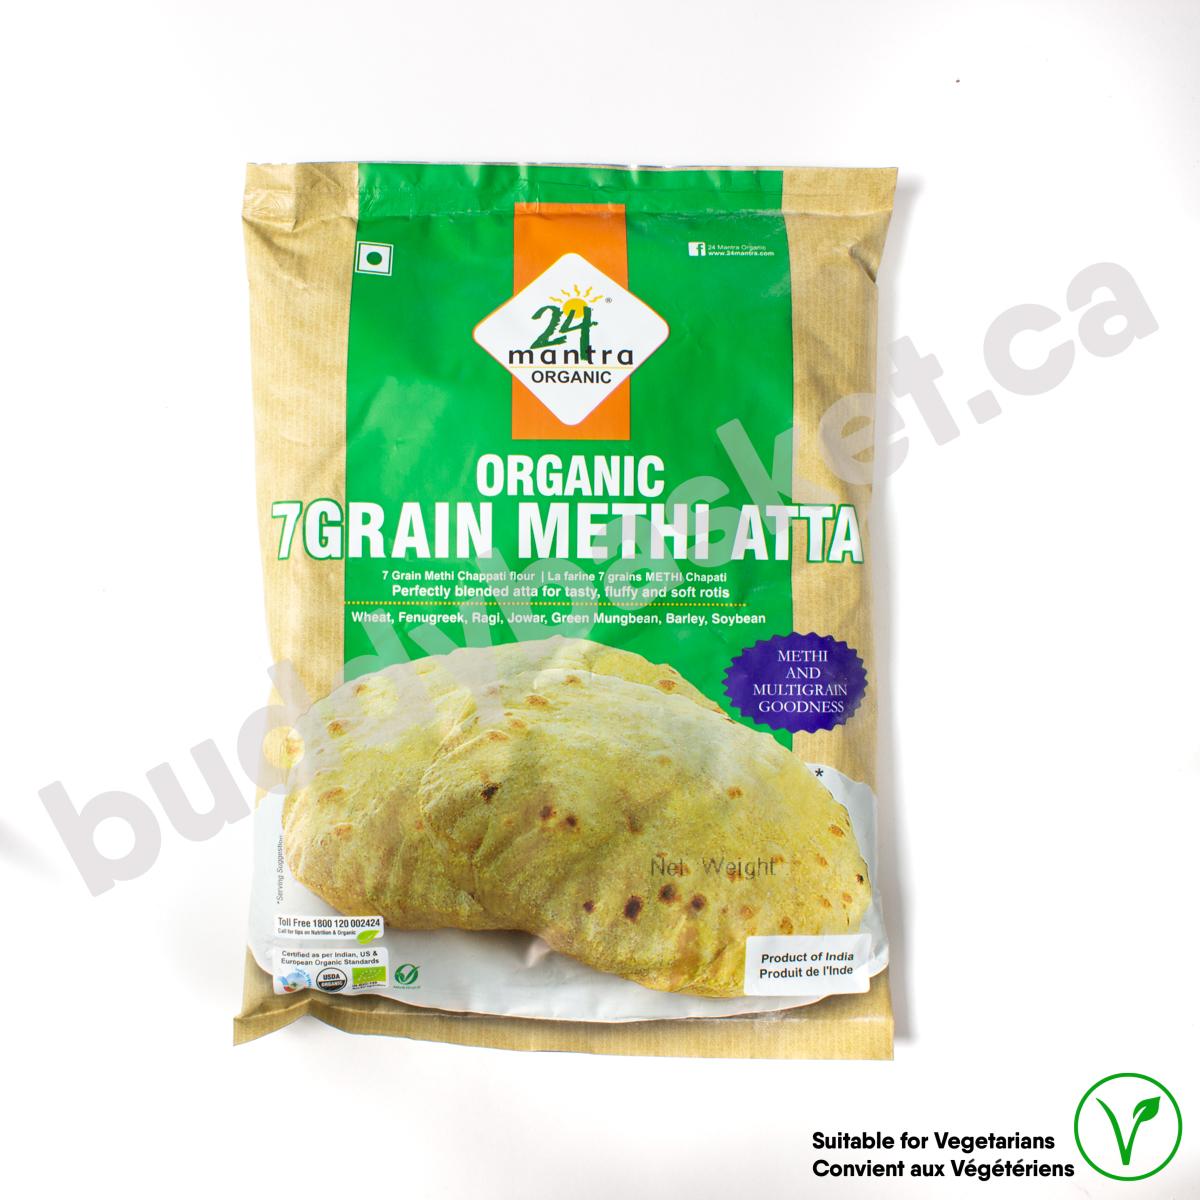 24 Mantra Organic Methi Atta 1kg